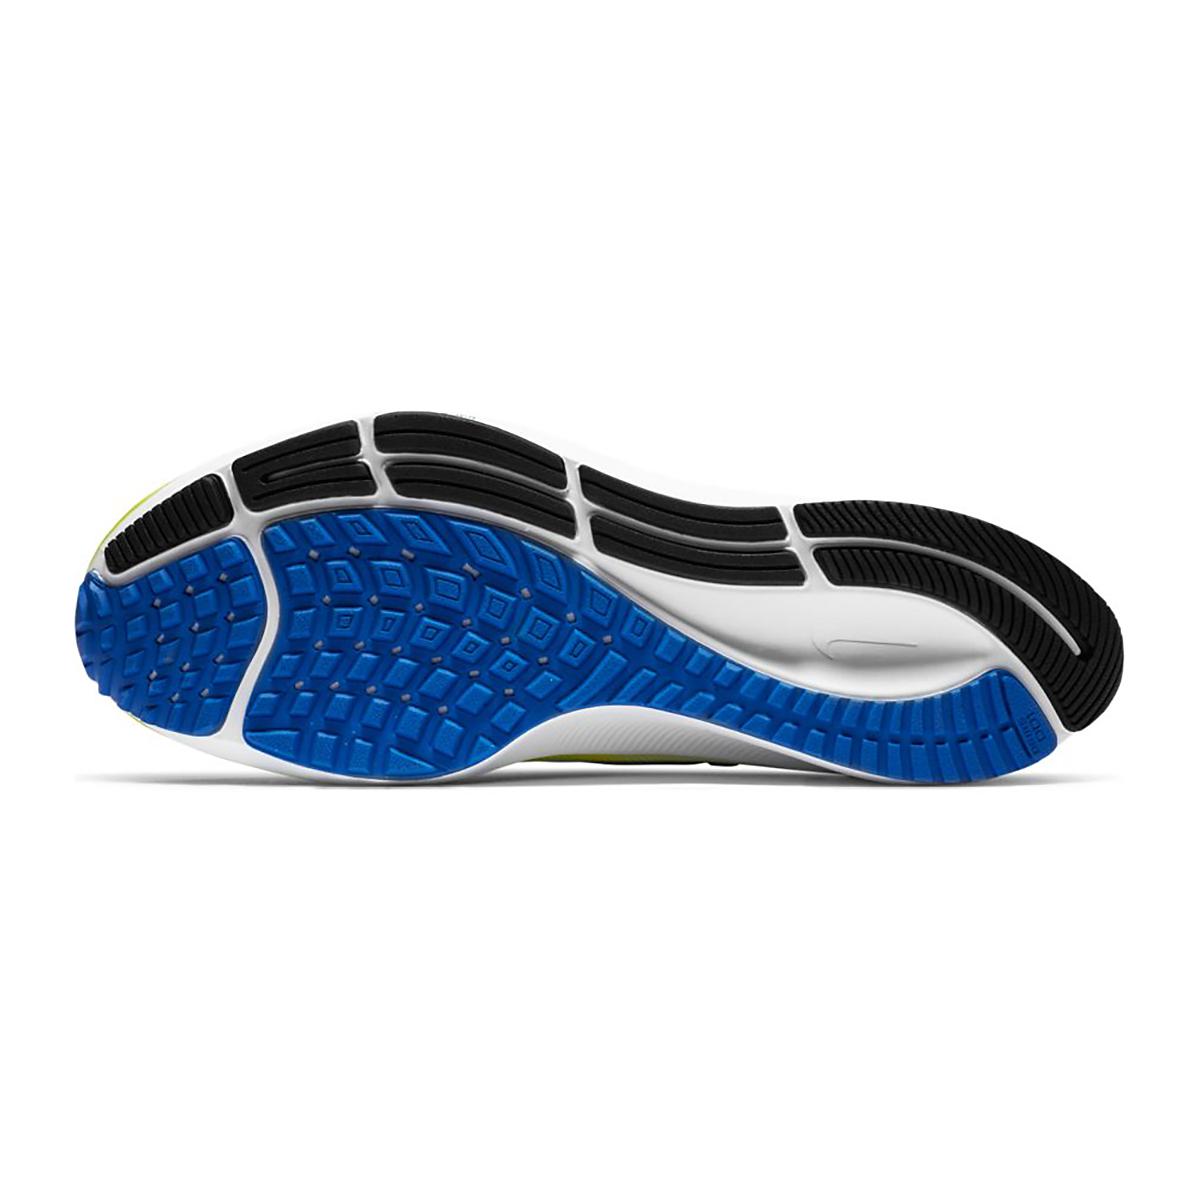 Men's Nike Air Zoom Pegasus 37 Running Shoe - Color: White/Racer Blue/Cyber/Black - Size: 6 - Width: Regular, White/Racer Blue/Cyber/Black, large, image 3